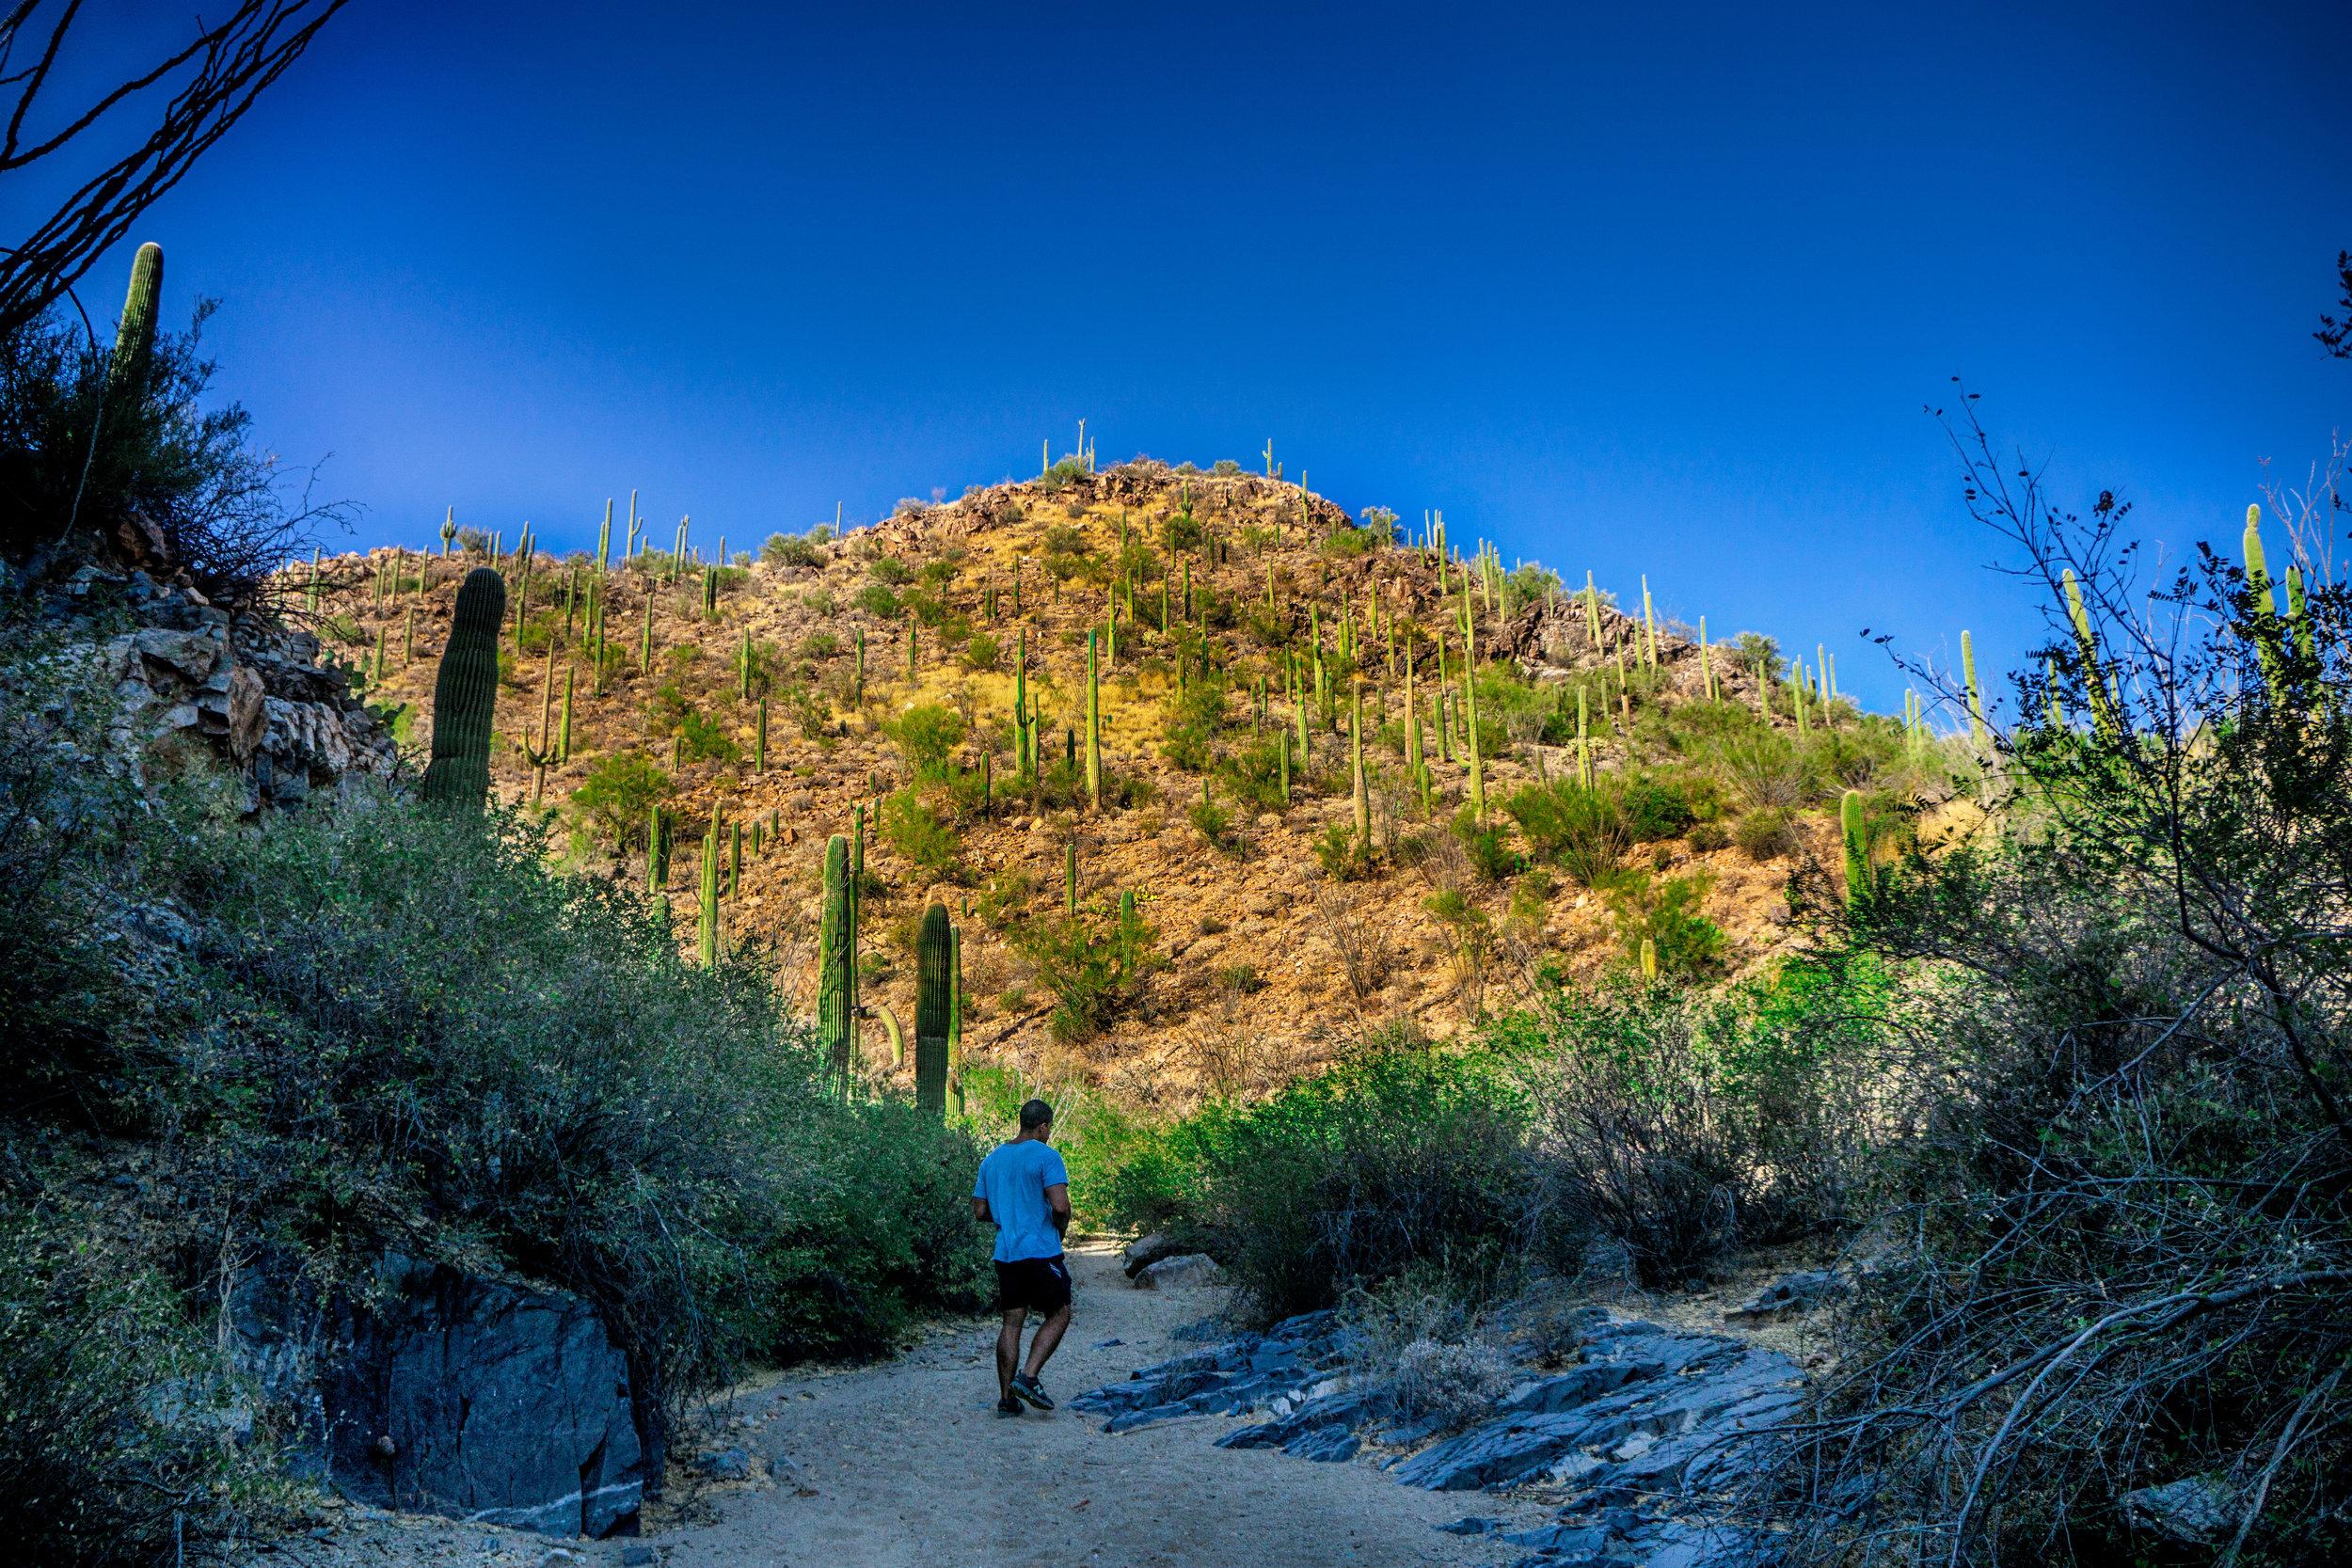 vickygood_photography_nature_saguaro-park7.jpg